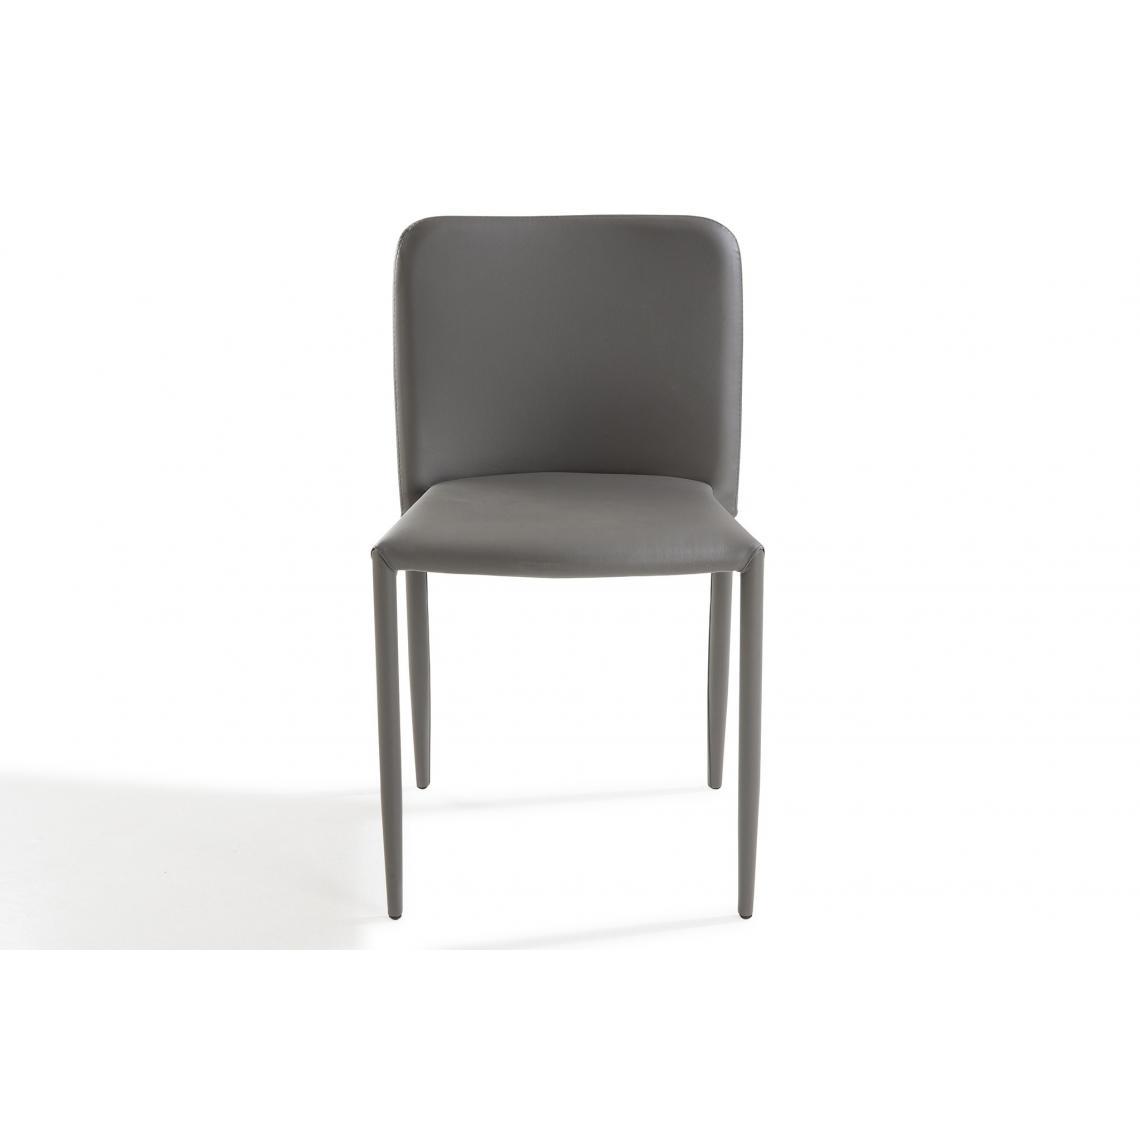 chaise design grise sergen 3suisses. Black Bedroom Furniture Sets. Home Design Ideas